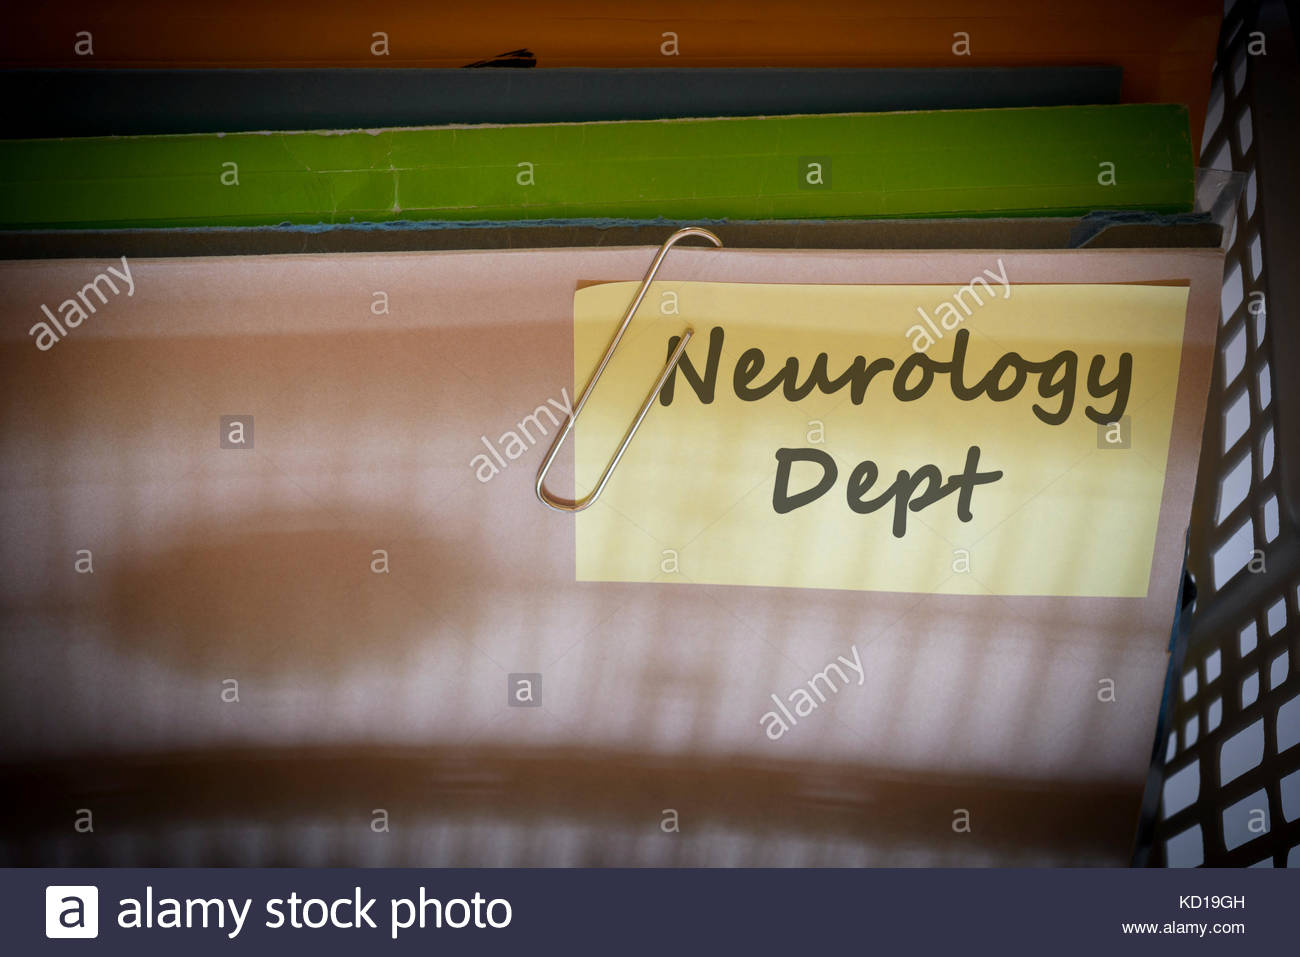 Neurology Dept written on document folder, Dorset, England. - Stock Image